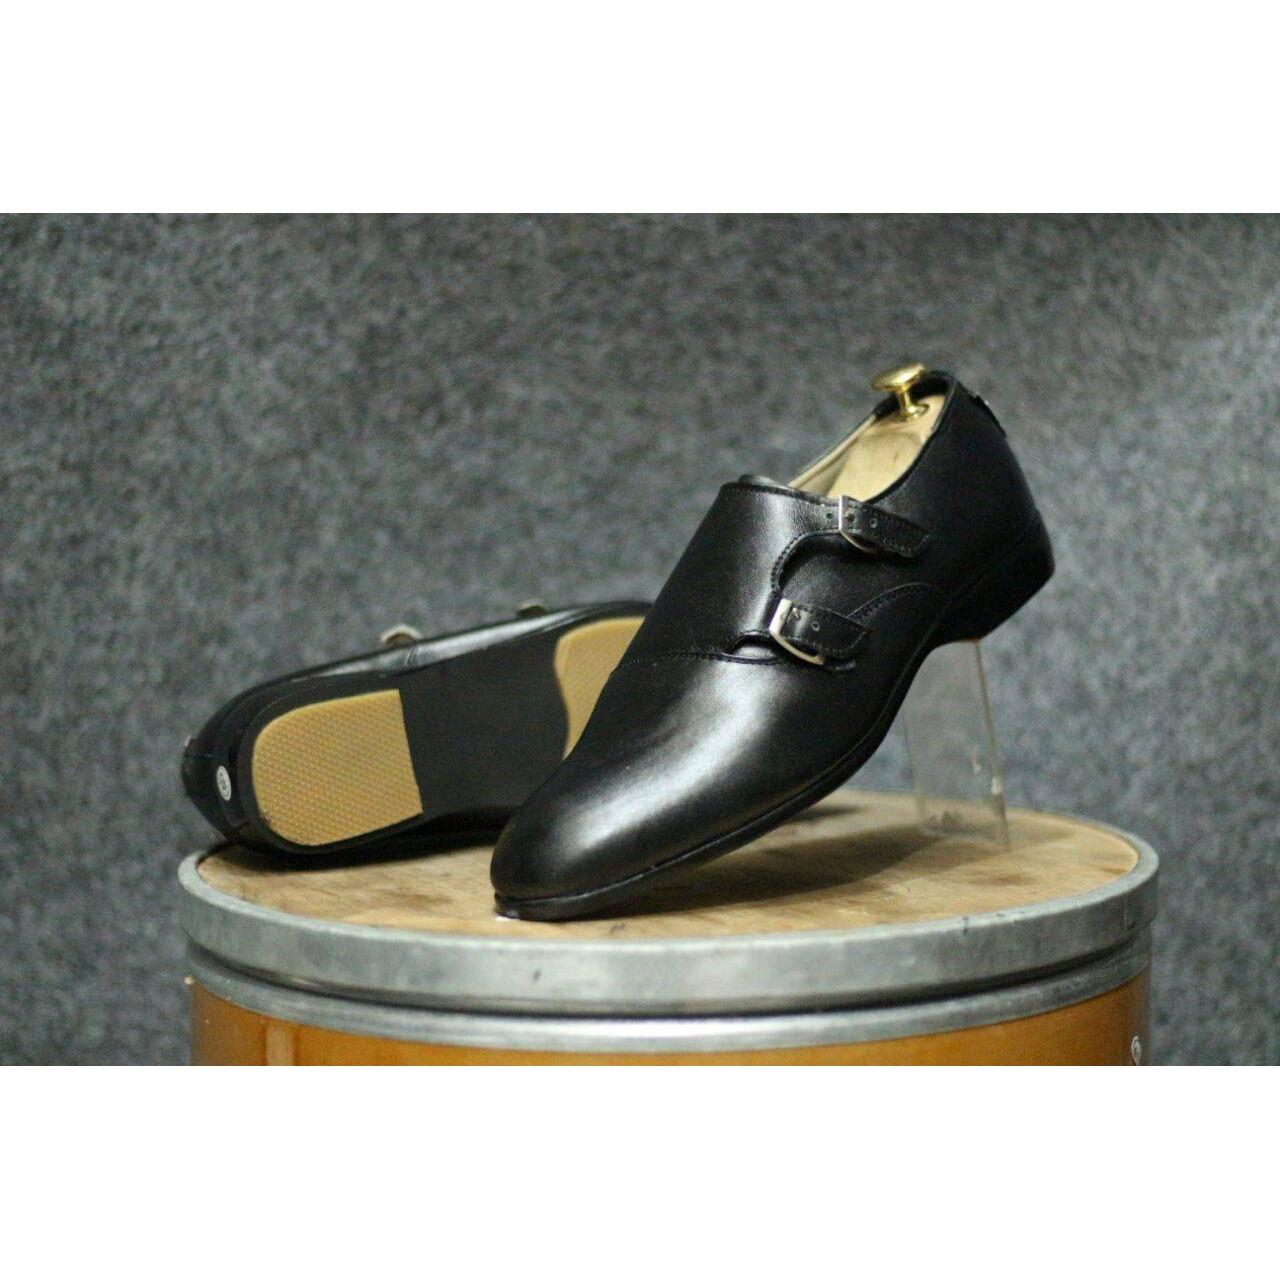 YAHLAMU - Sepatu Pantofel Formal Kulit CVNY DUMAS Pria / Sepatu kerja / Kickers / Bally / Yongki/ CEVANY